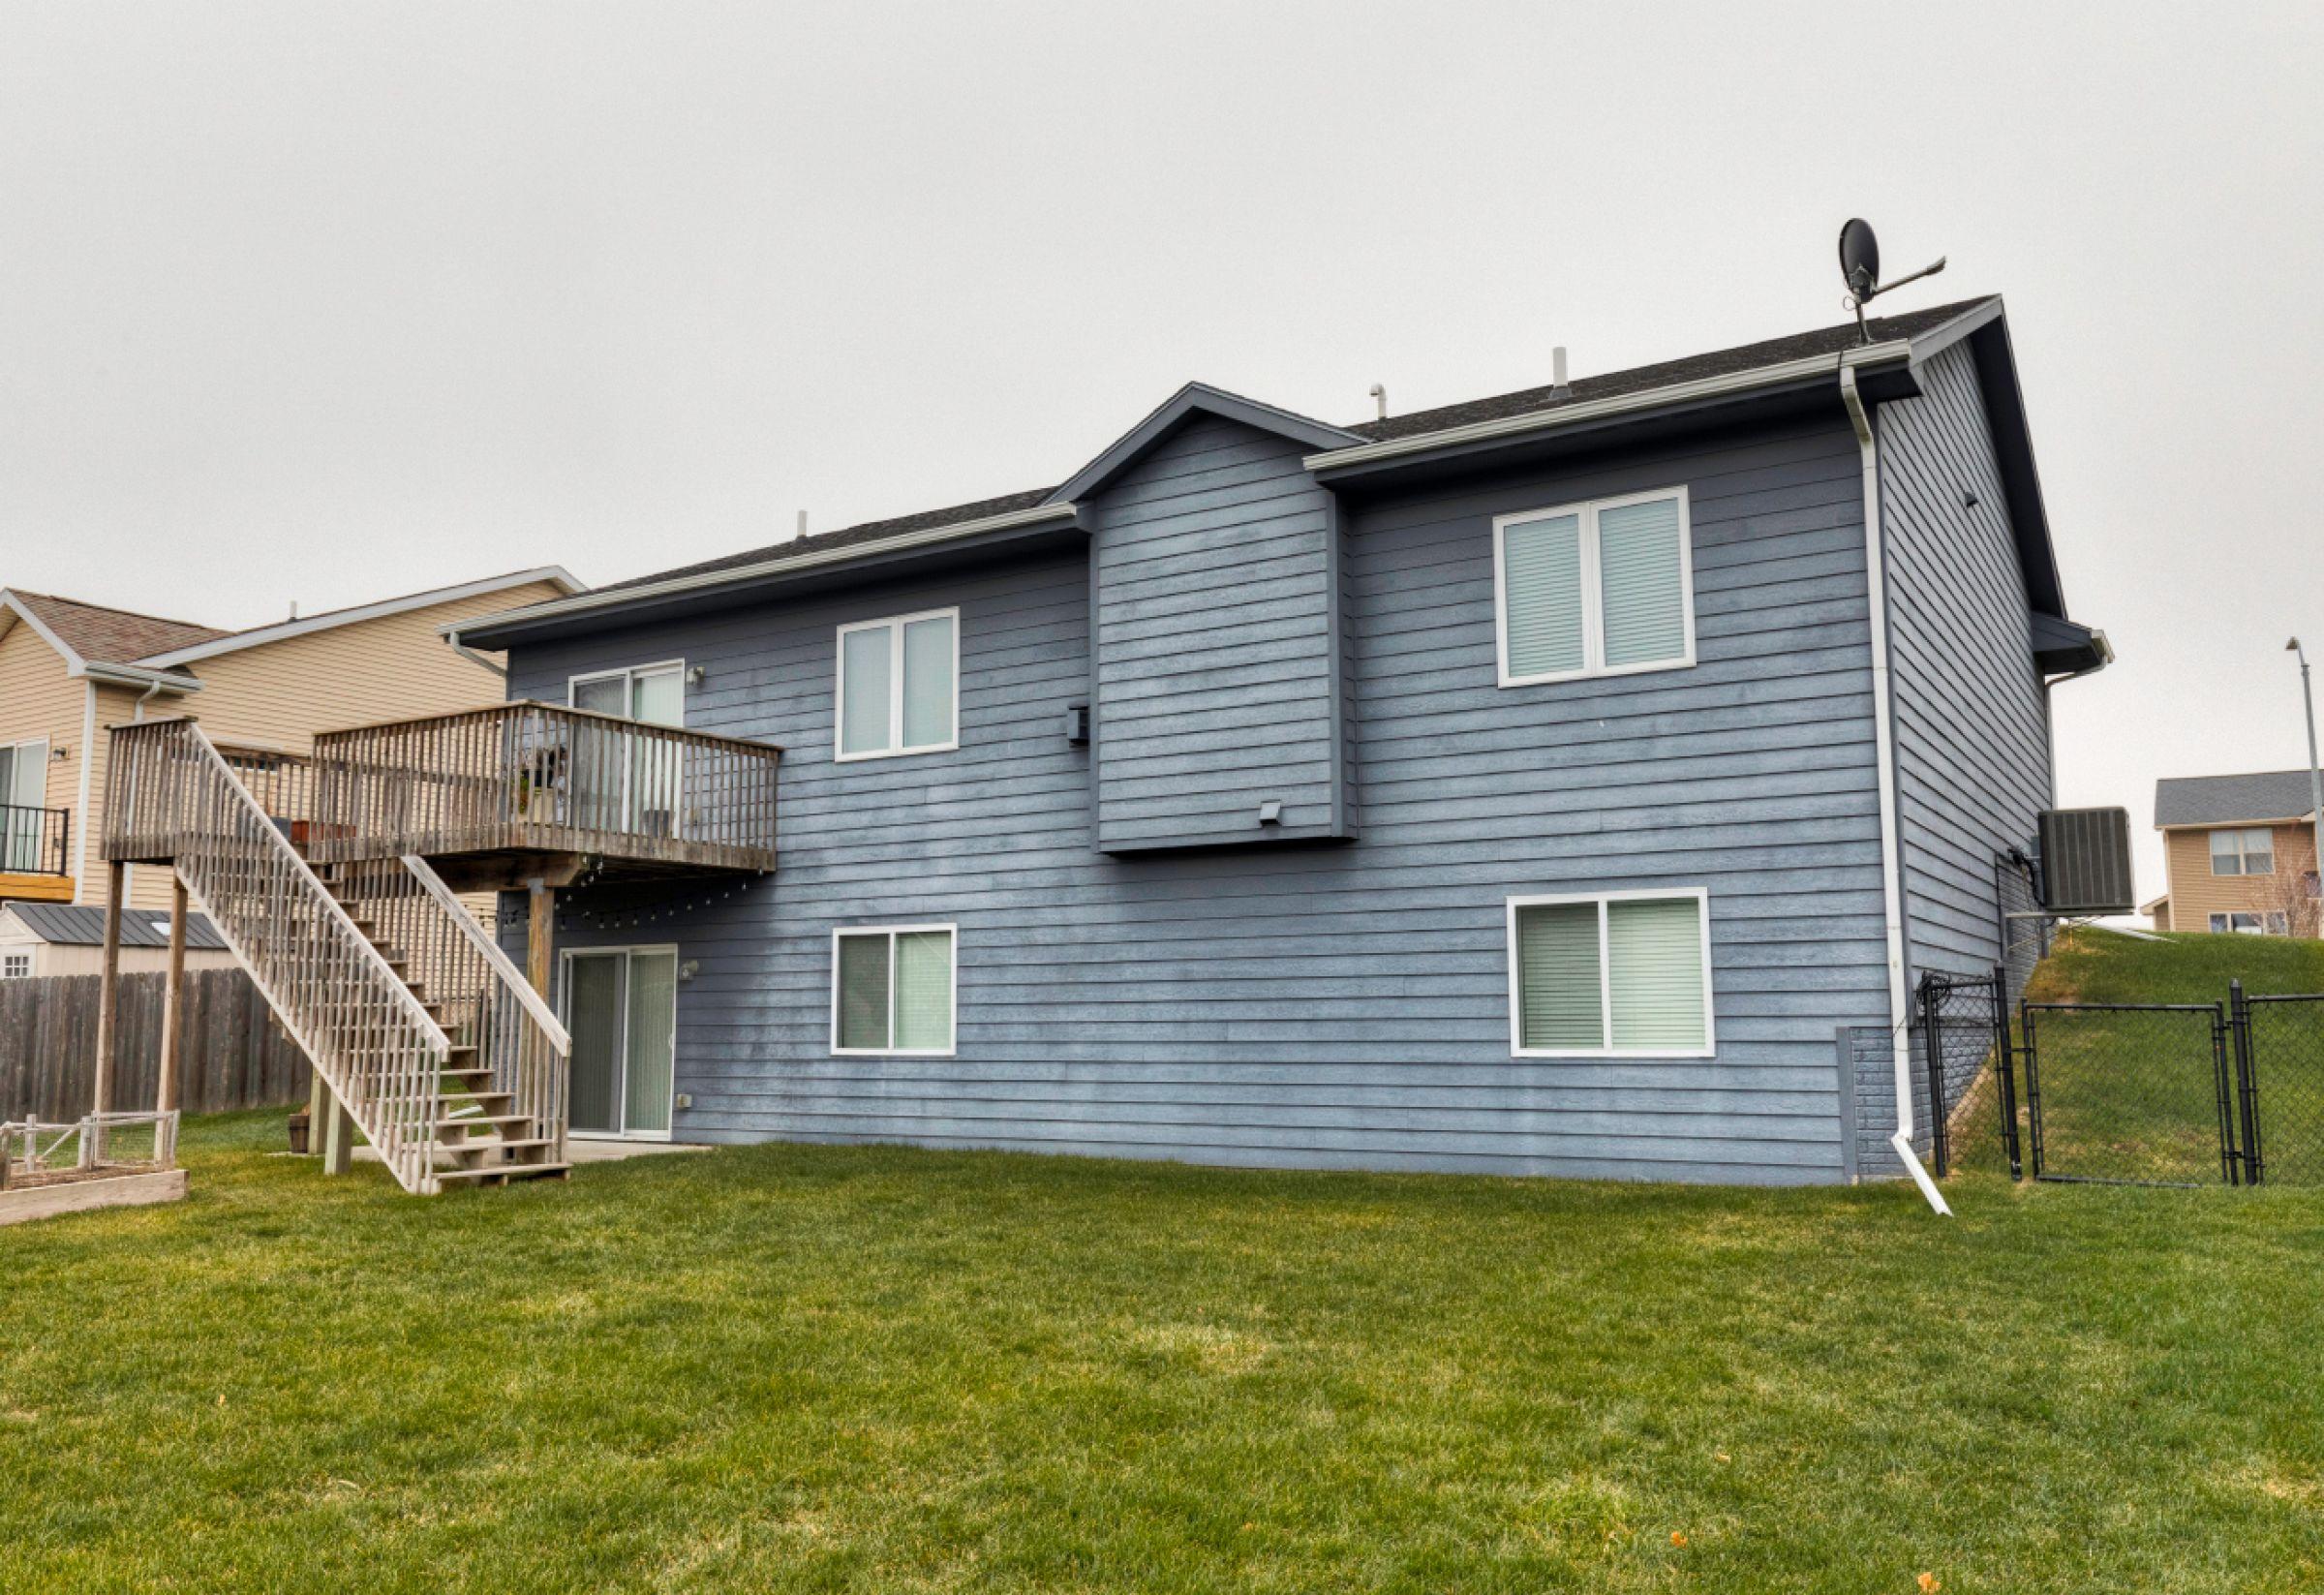 residential-polk-county-iowa-0-acres-listing-number-15273-2-2020-12-08-002830.jpg